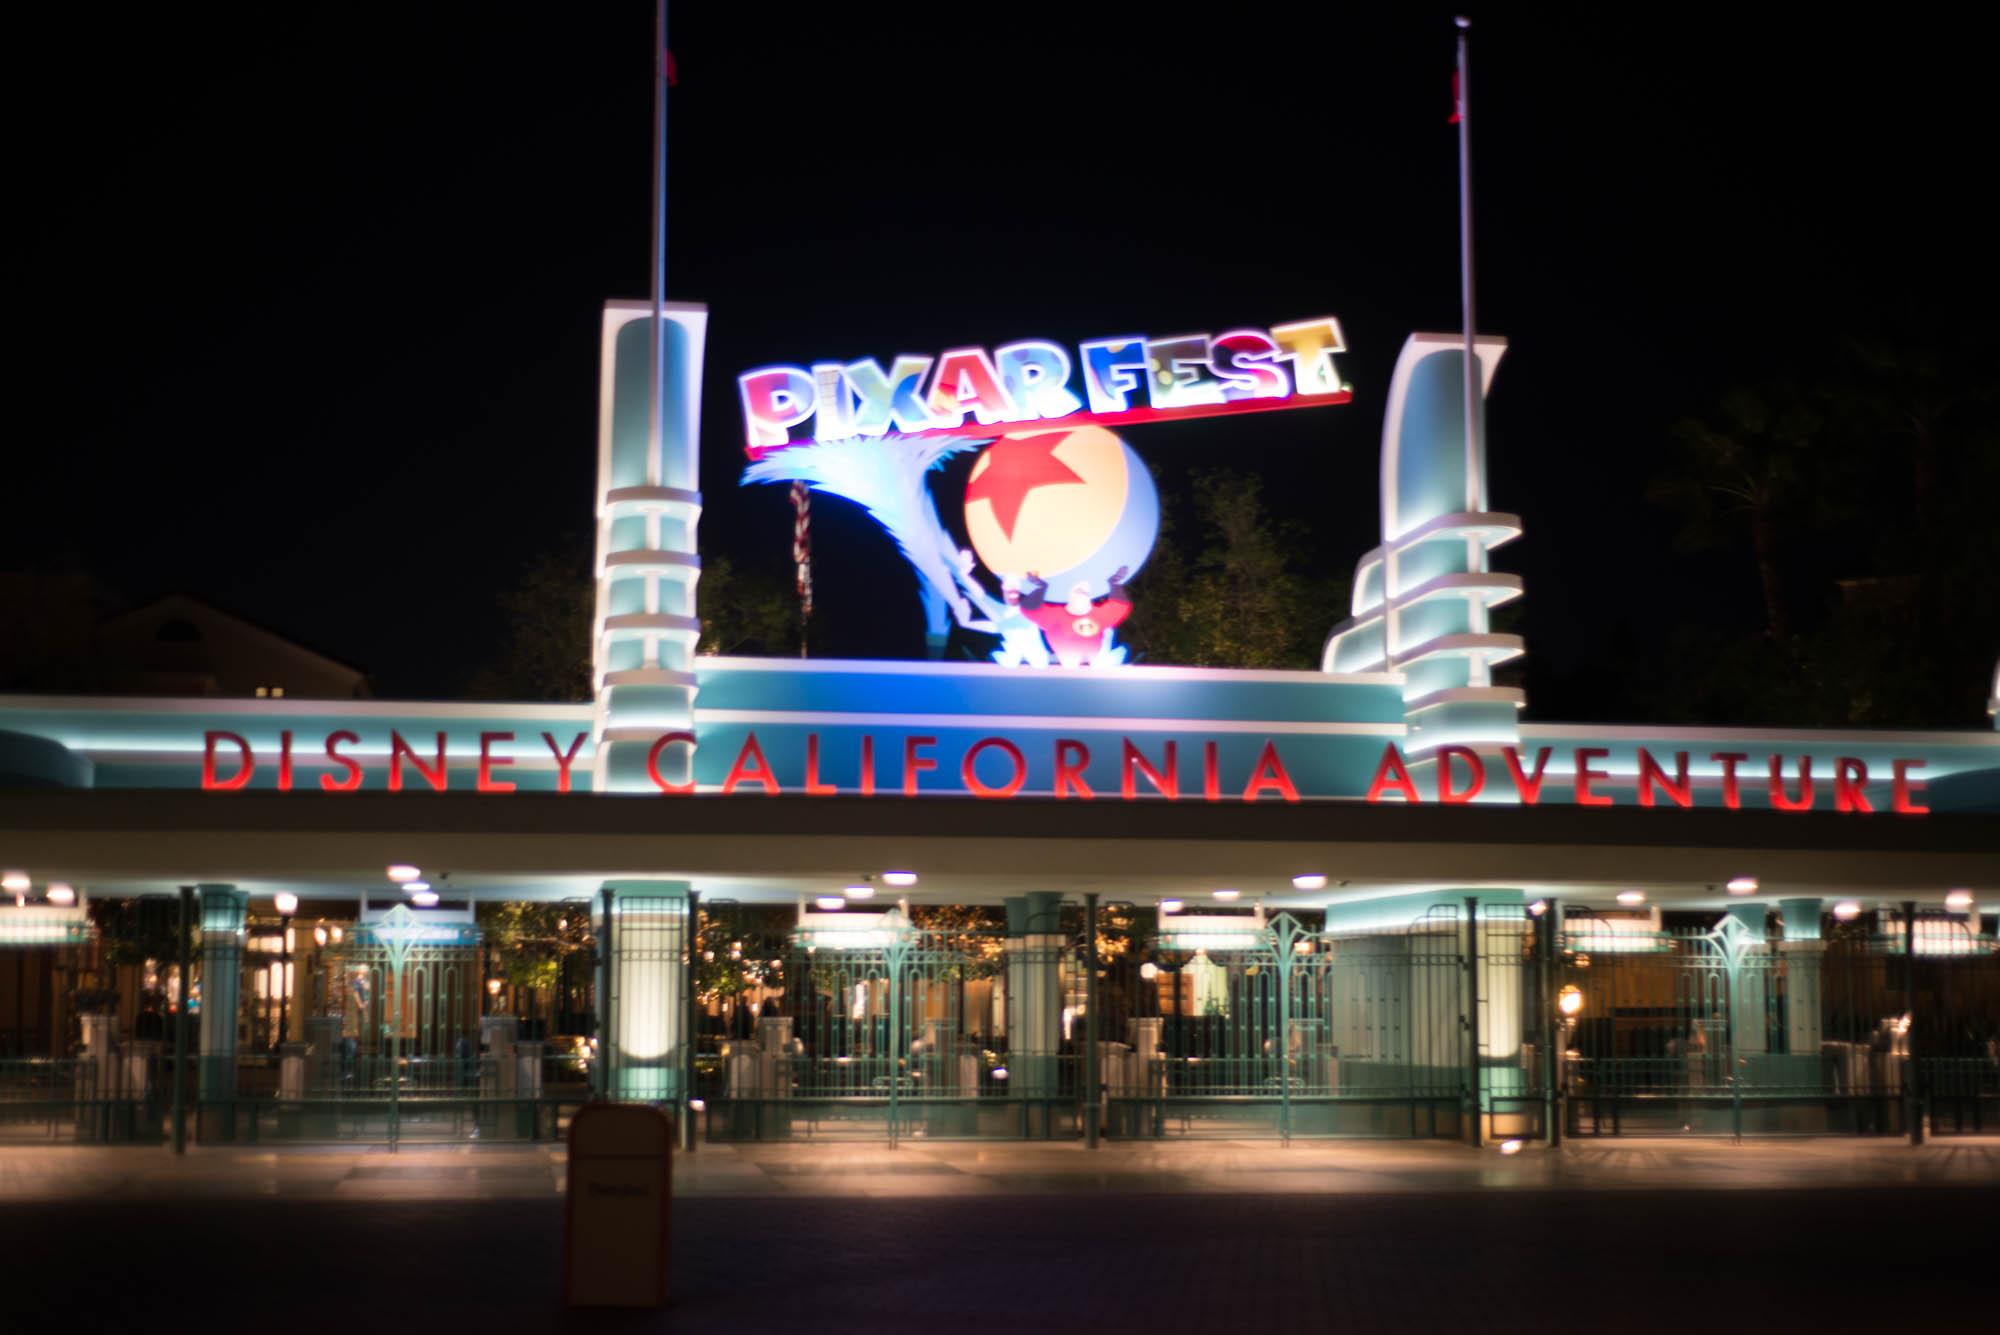 Pixar Fest Sign at Disneyland's California Adventure Entrance